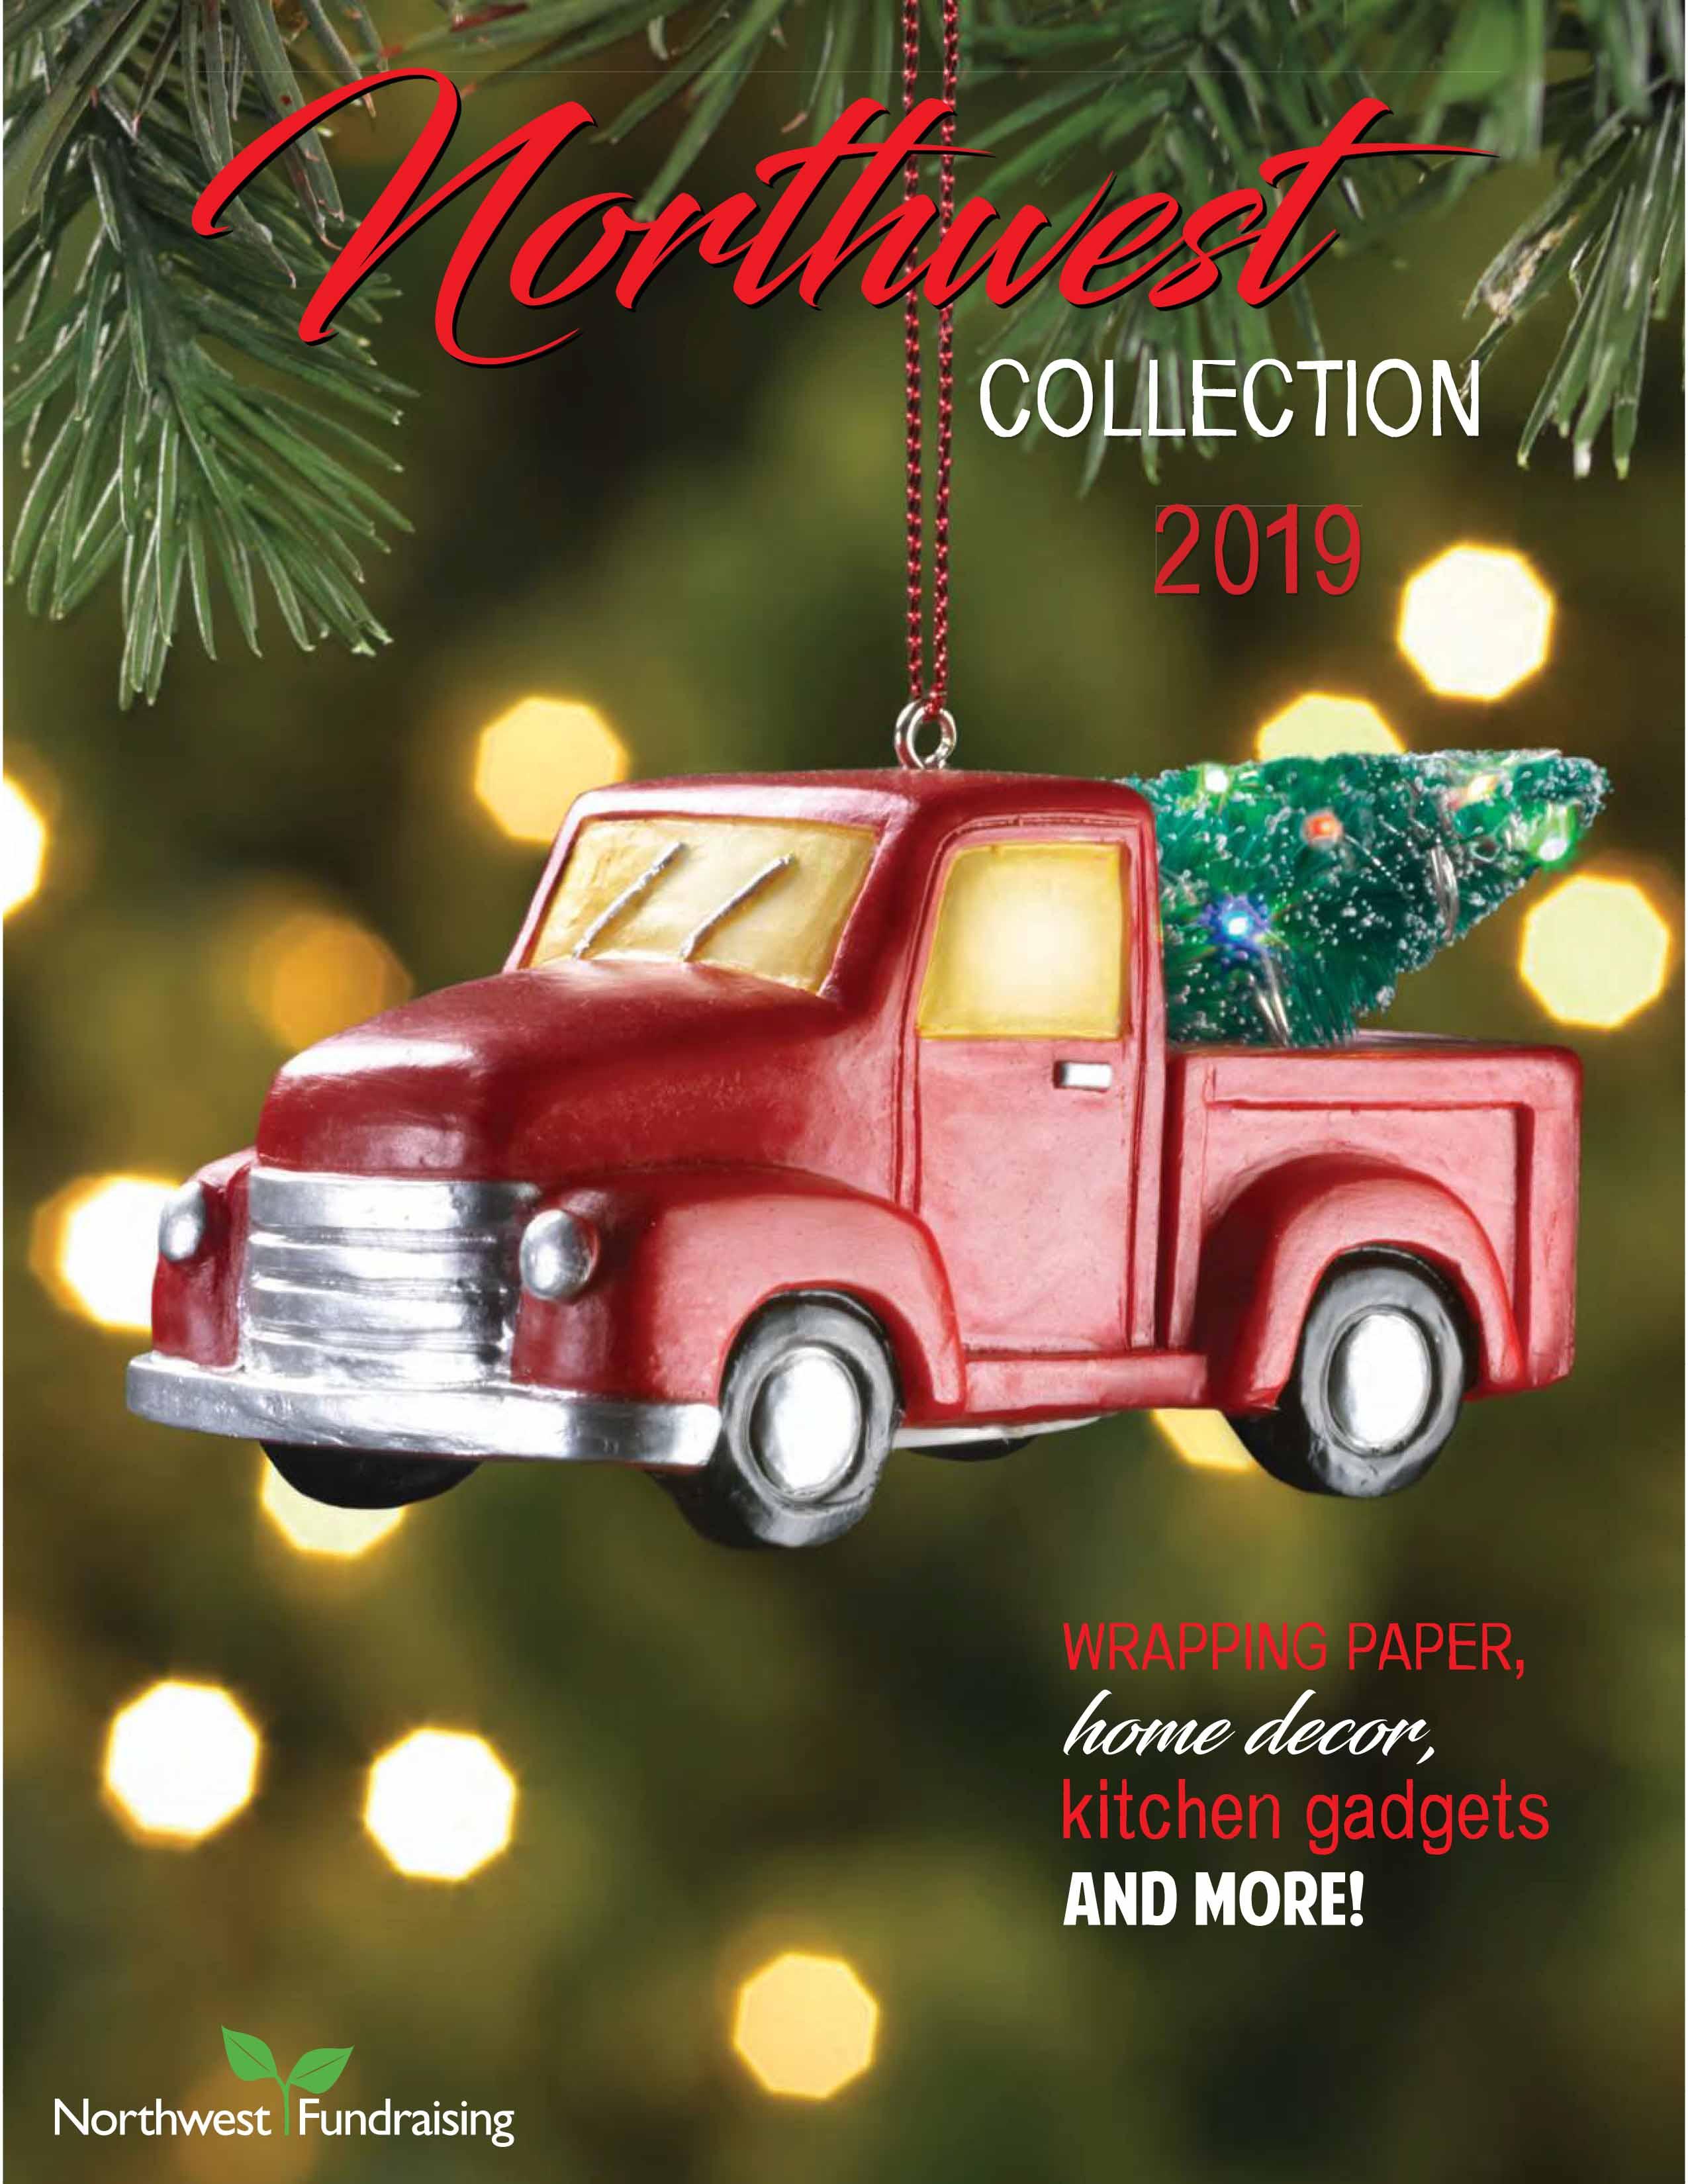 Northwest Collection 2019